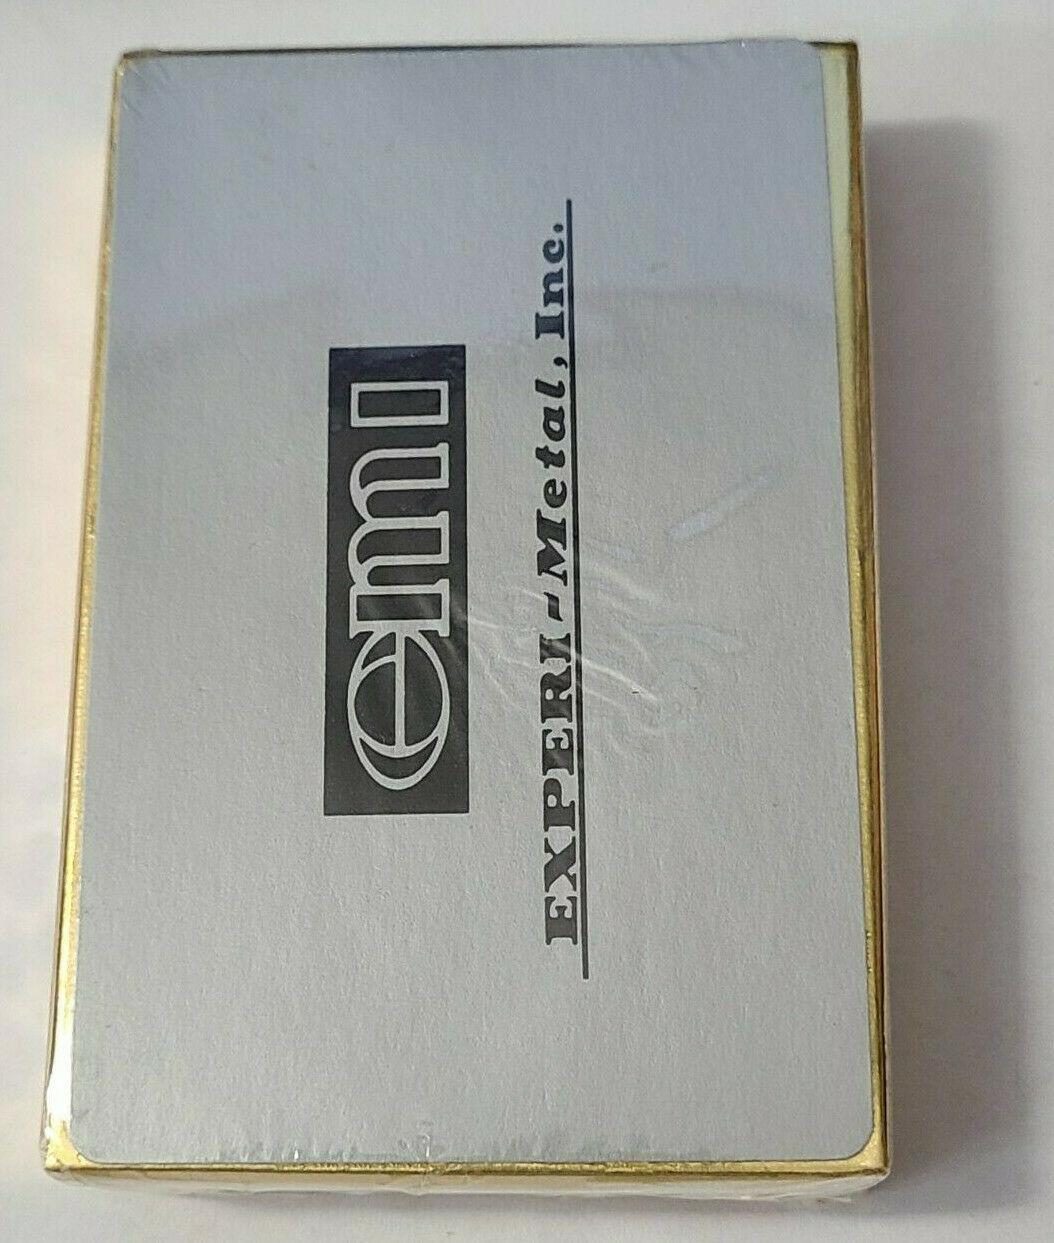 Experi-Metal, Inc. OMI Deck of Playing Cards   (#34)